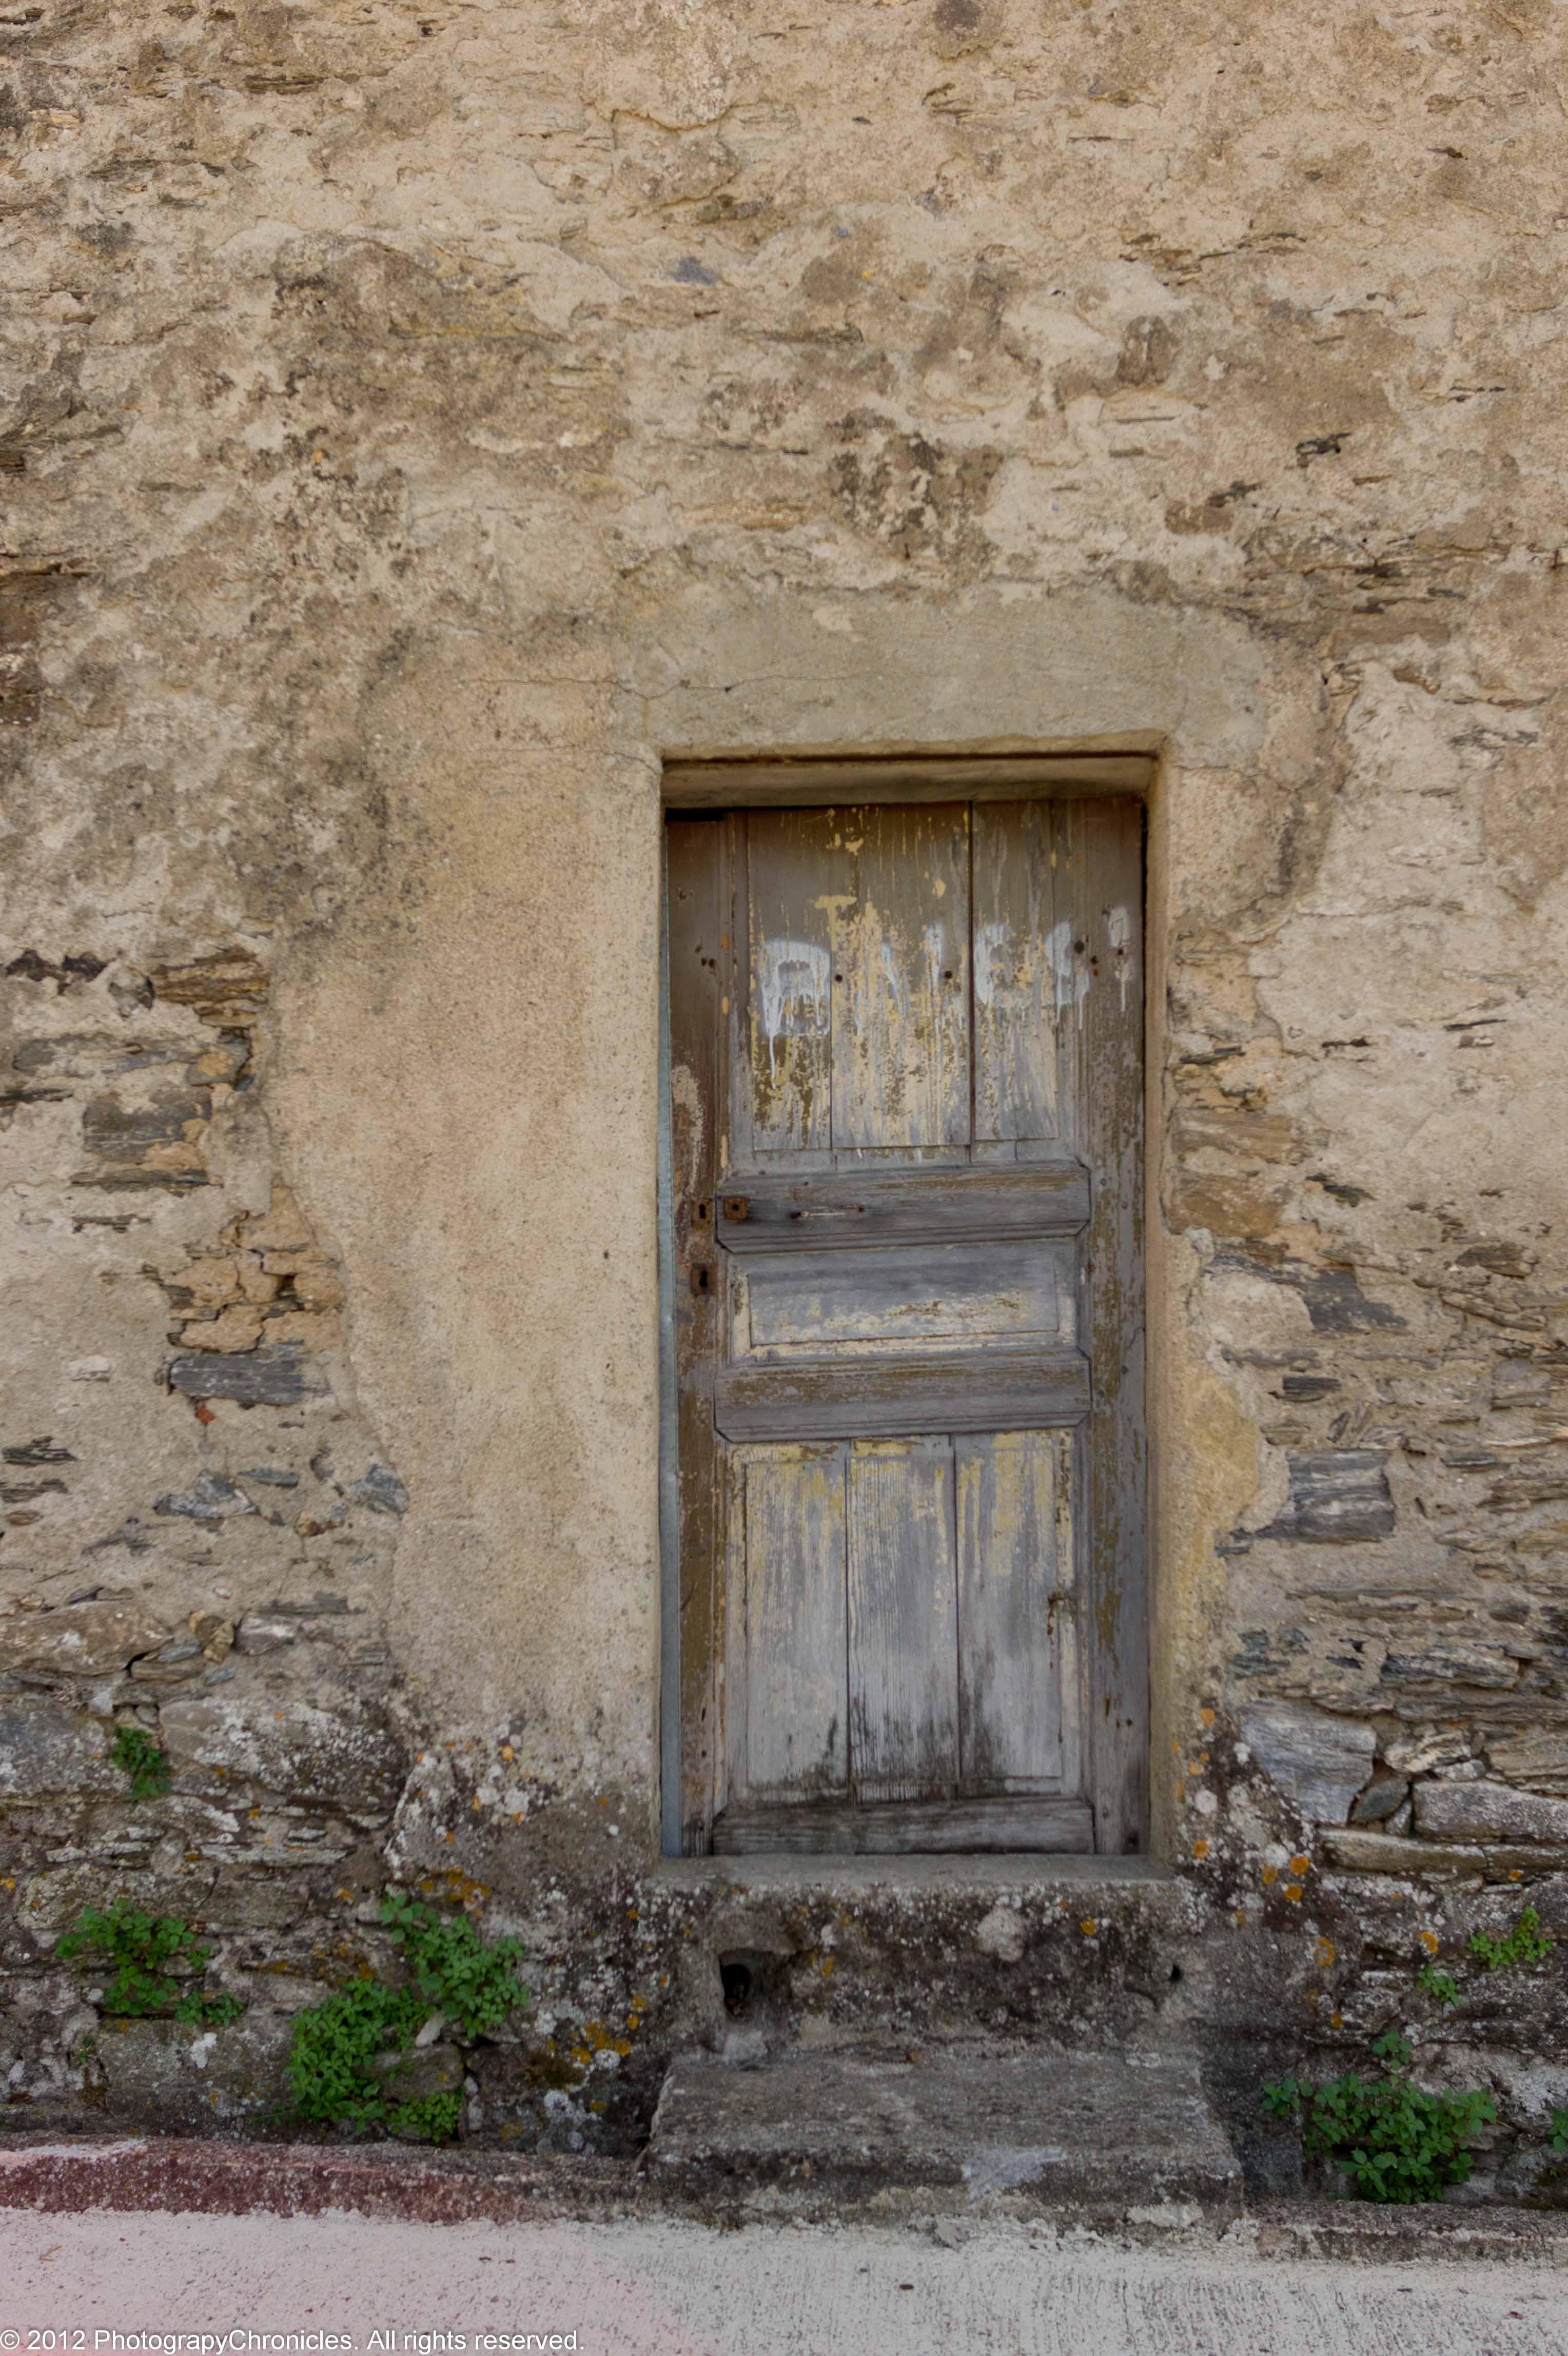 Rustic Entrance Doors : Rustic doors part i filip ghinea photography chronicles